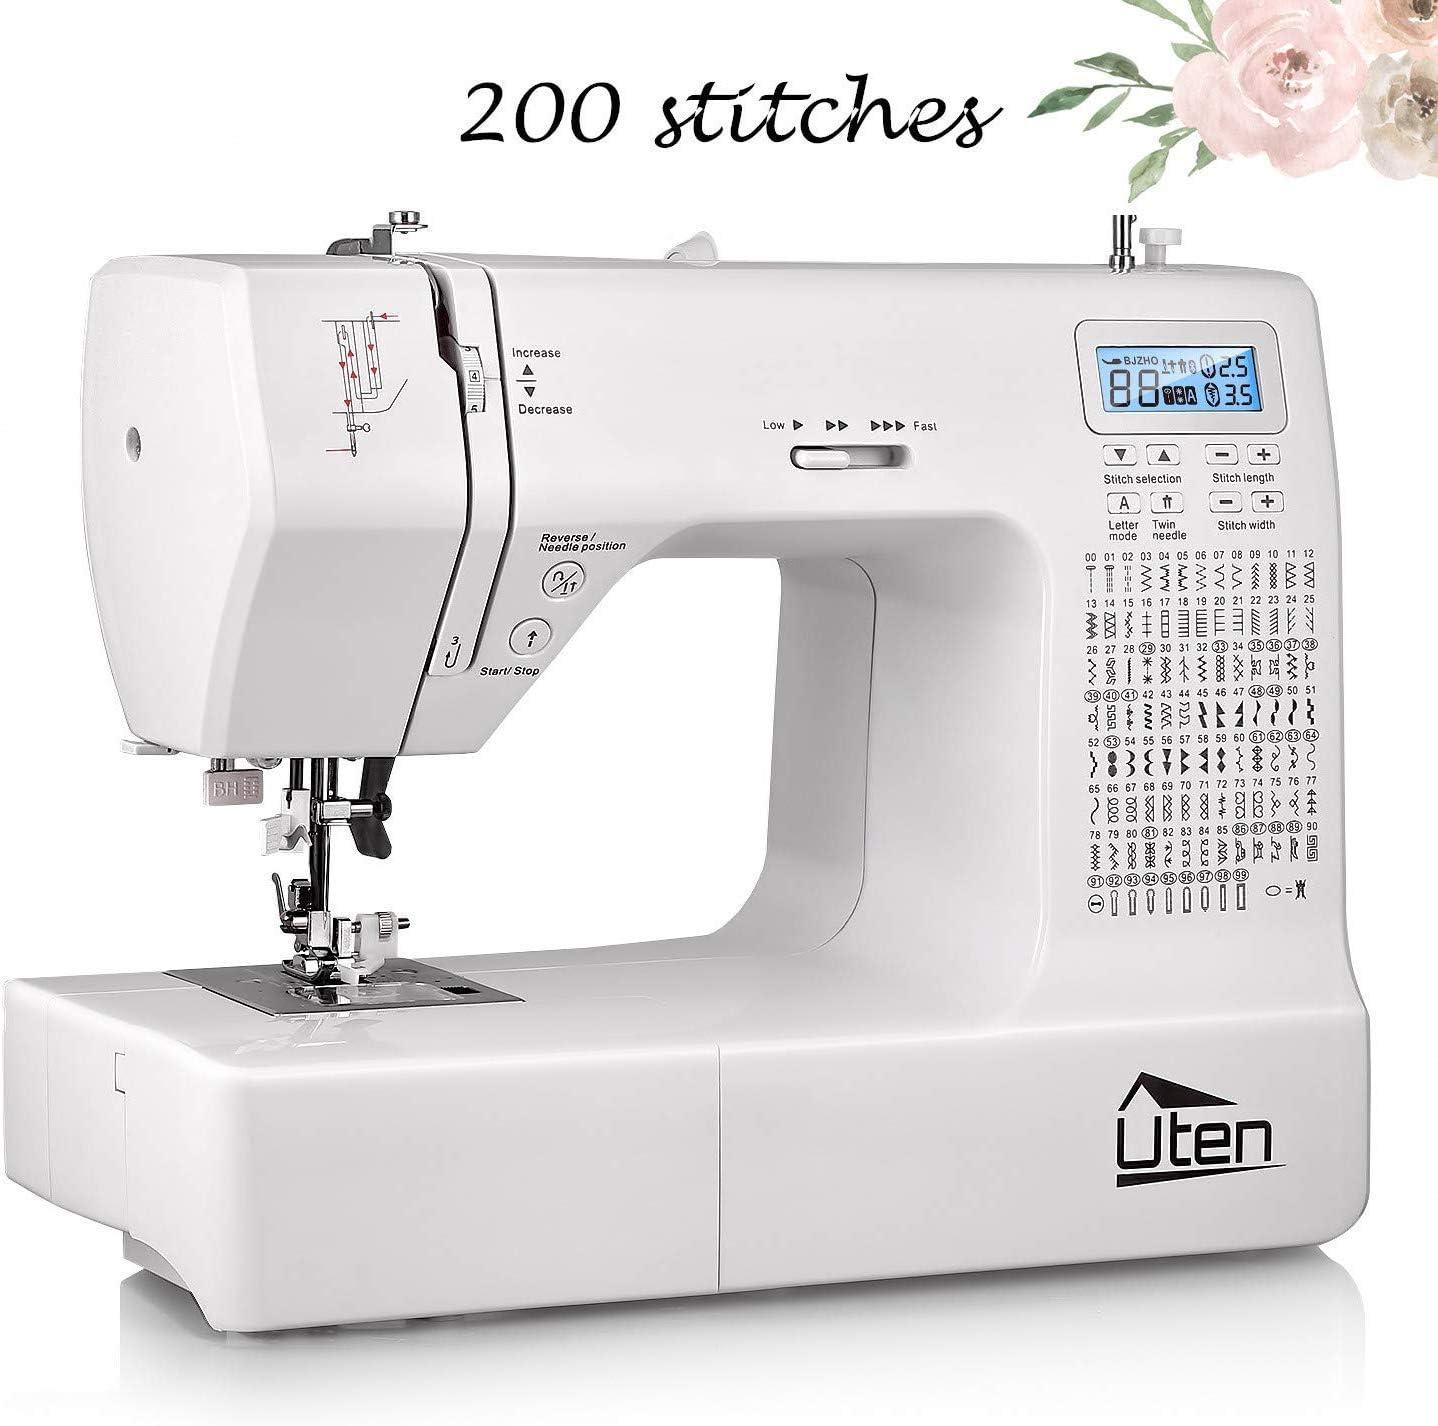 Segunda mano maquina de coser